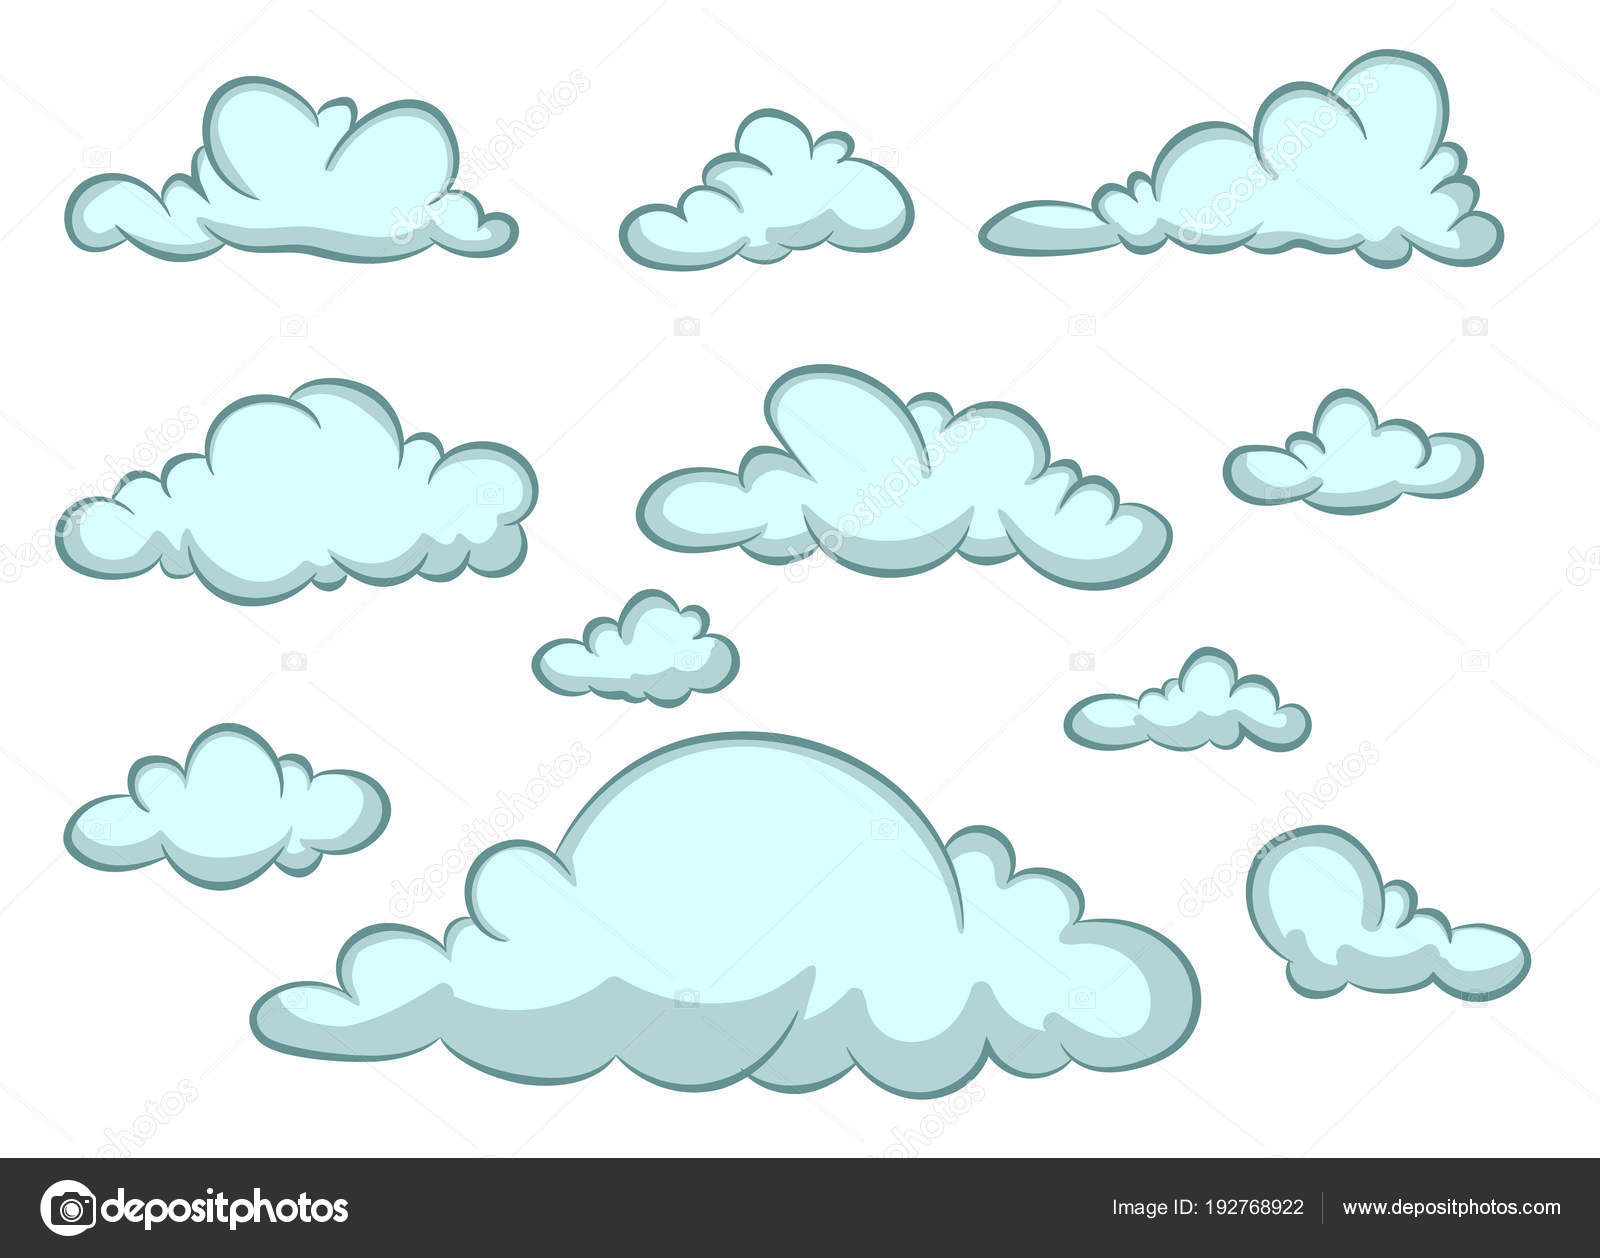 Cartoon Cloud Vector Set Blue Clouds — Stock Vector © King72 #192768922